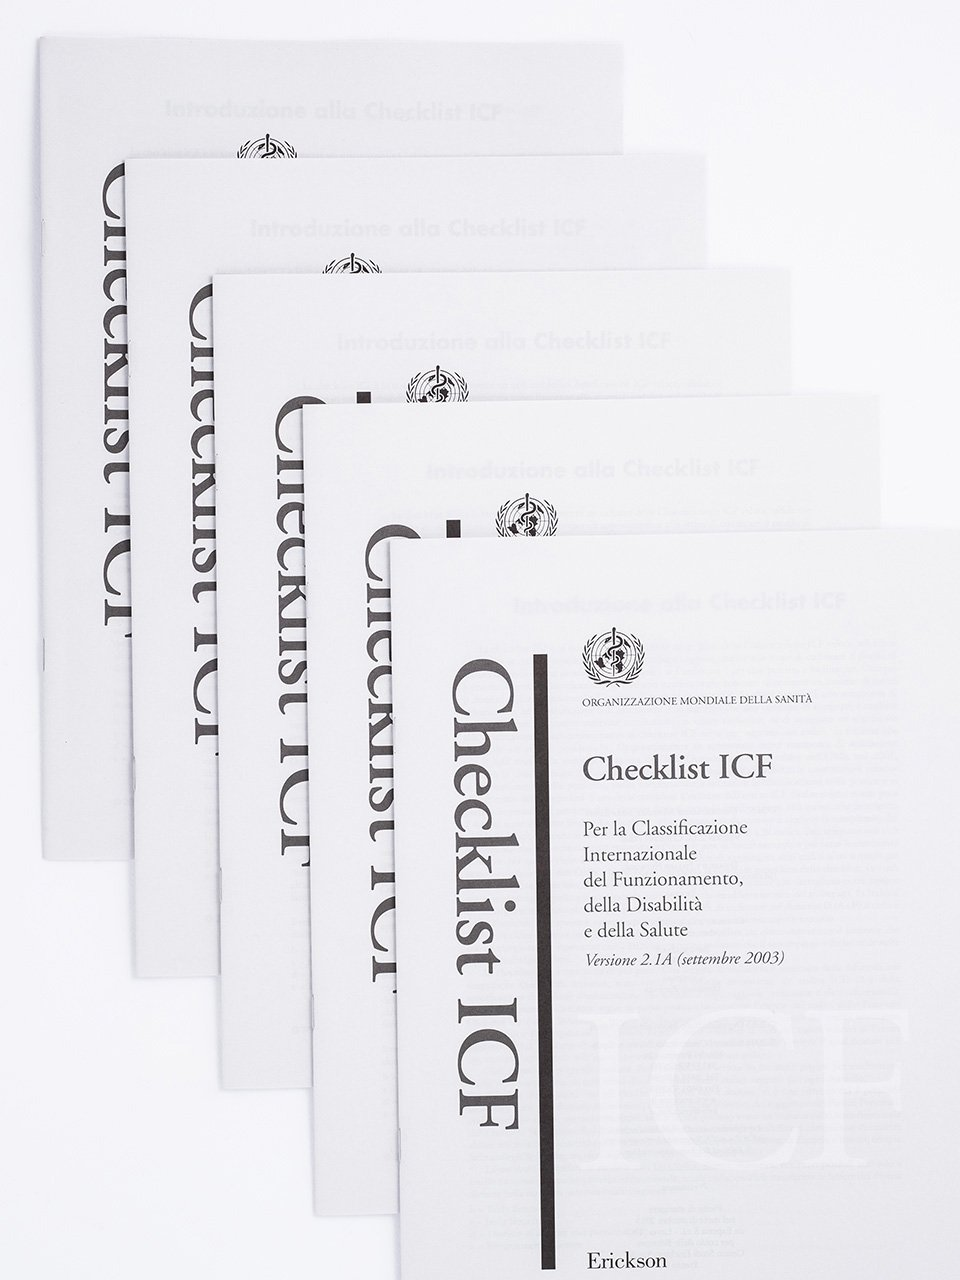 Checklist ICF - ICF-CY - Libri - Erickson